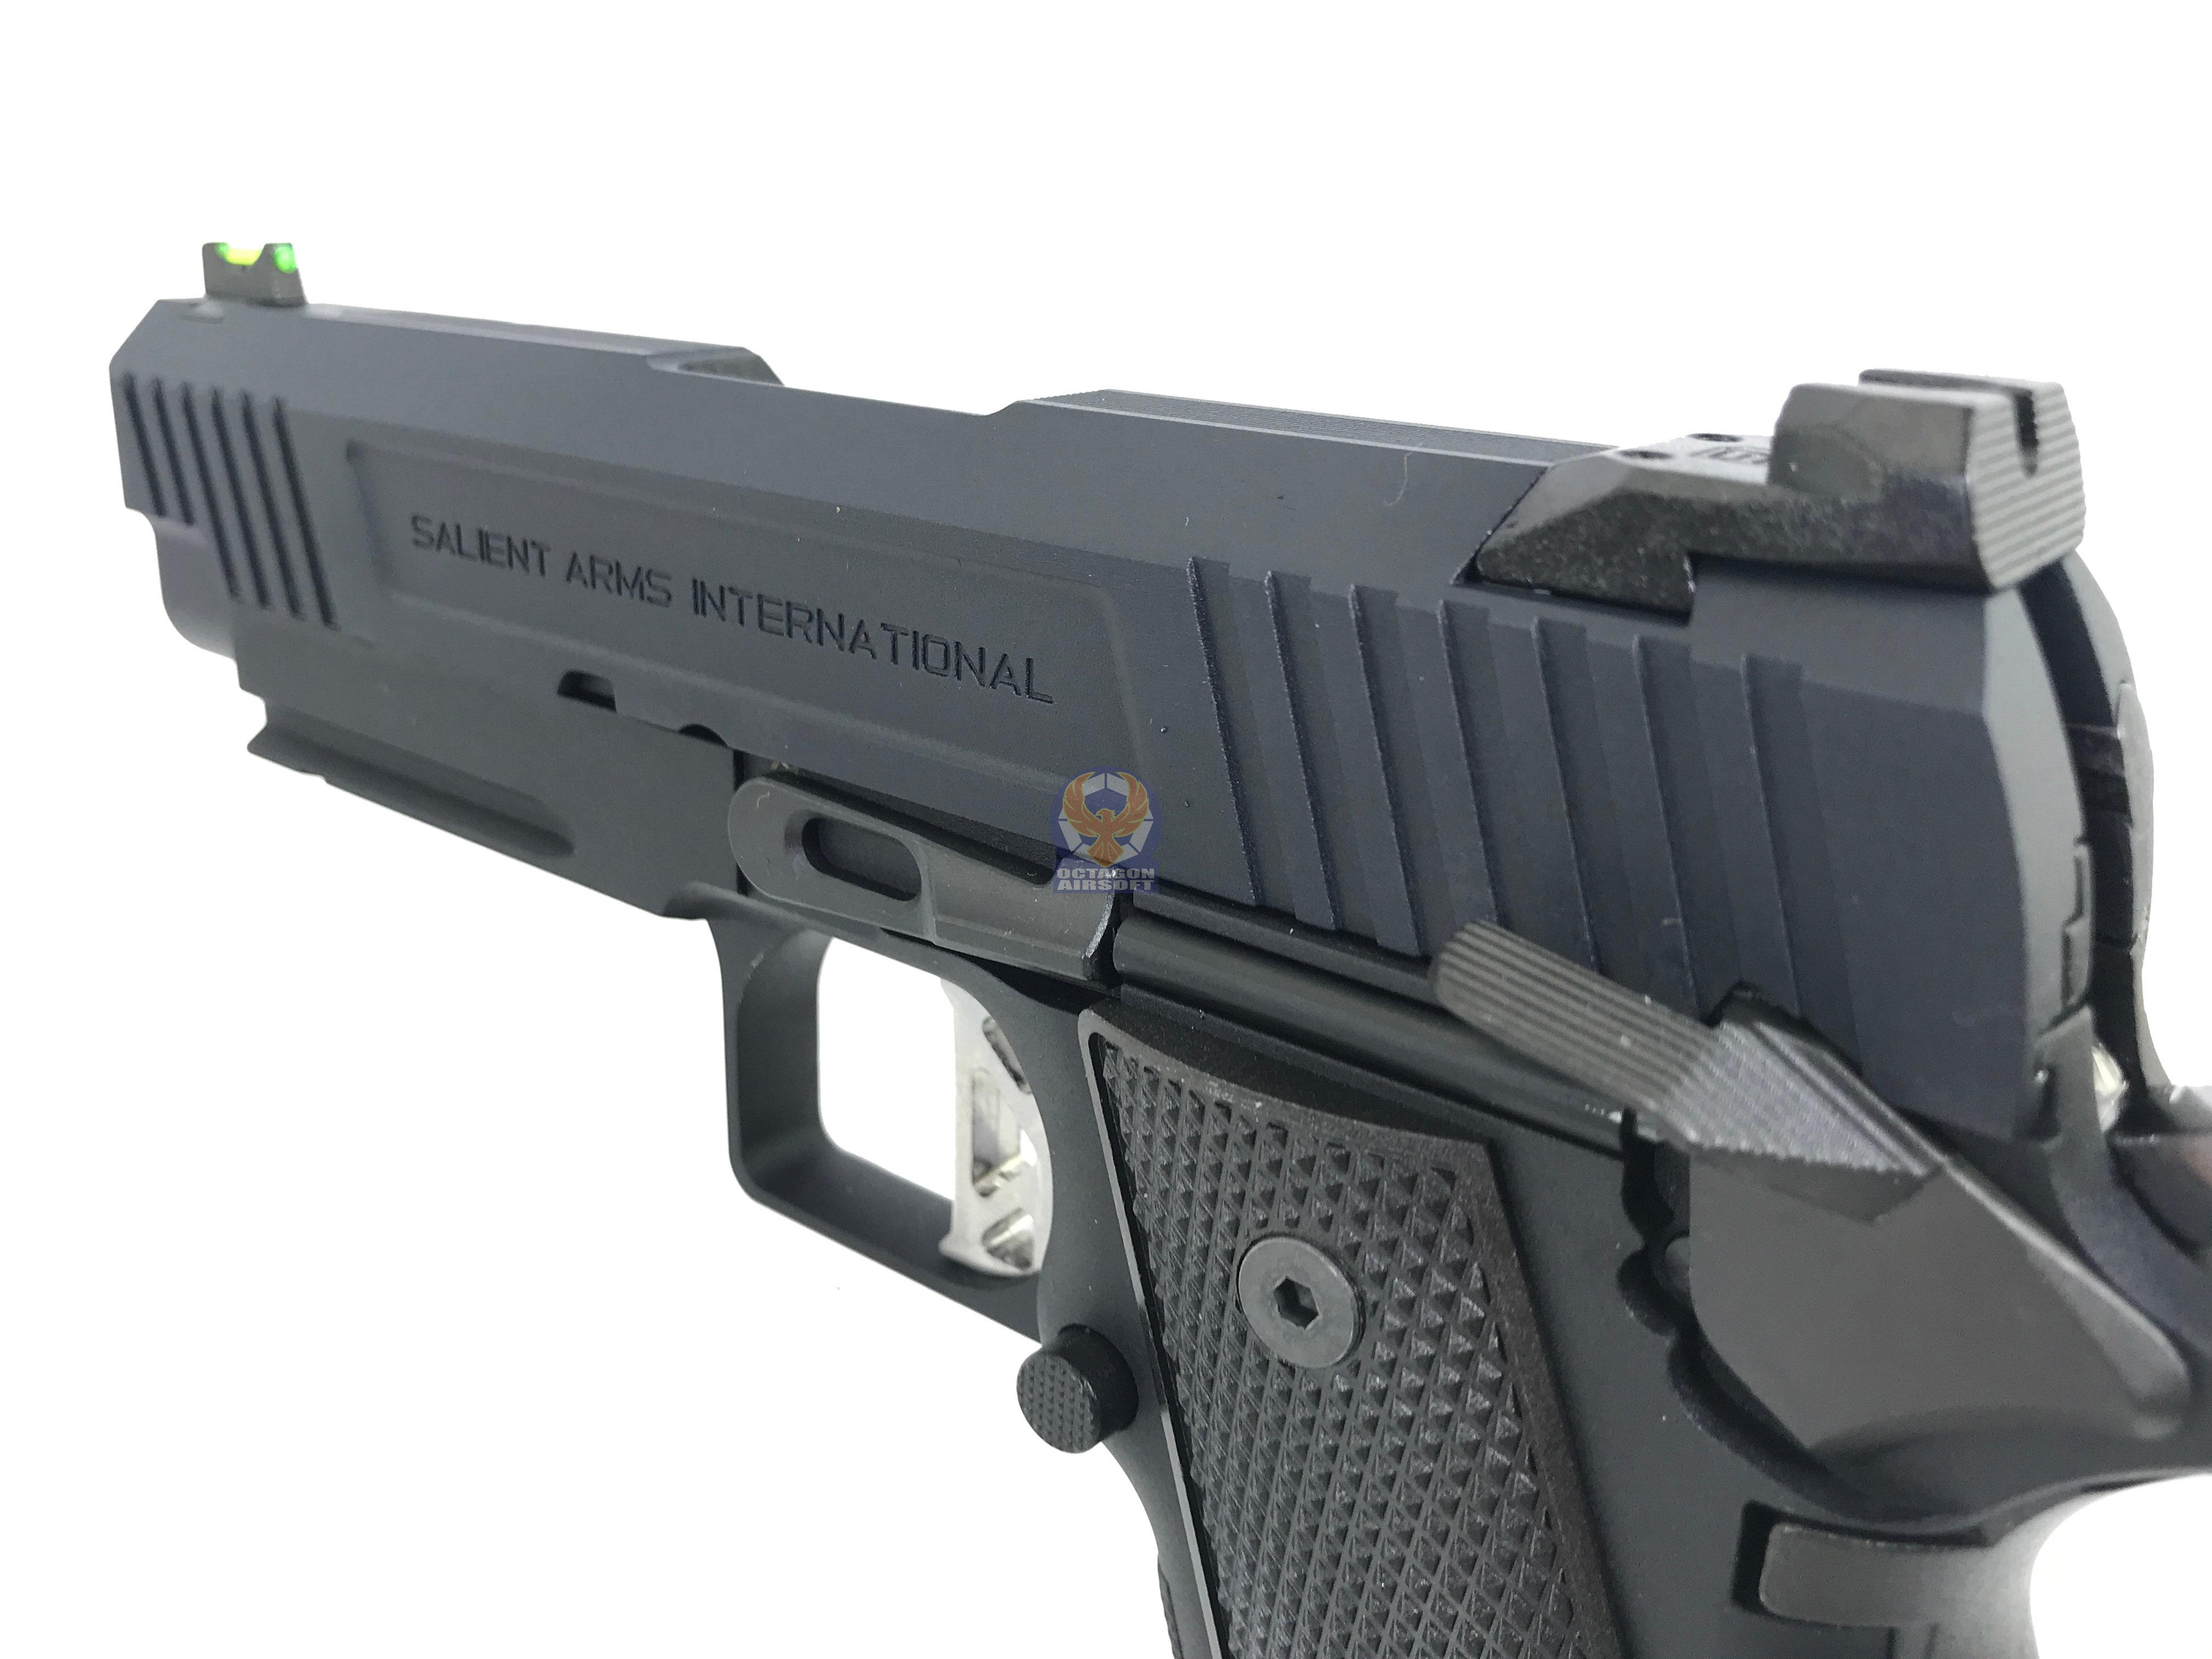 EMG / SAI 2011 DS Airsoft Training Pistol (Length: 4 3 / Aluminum)